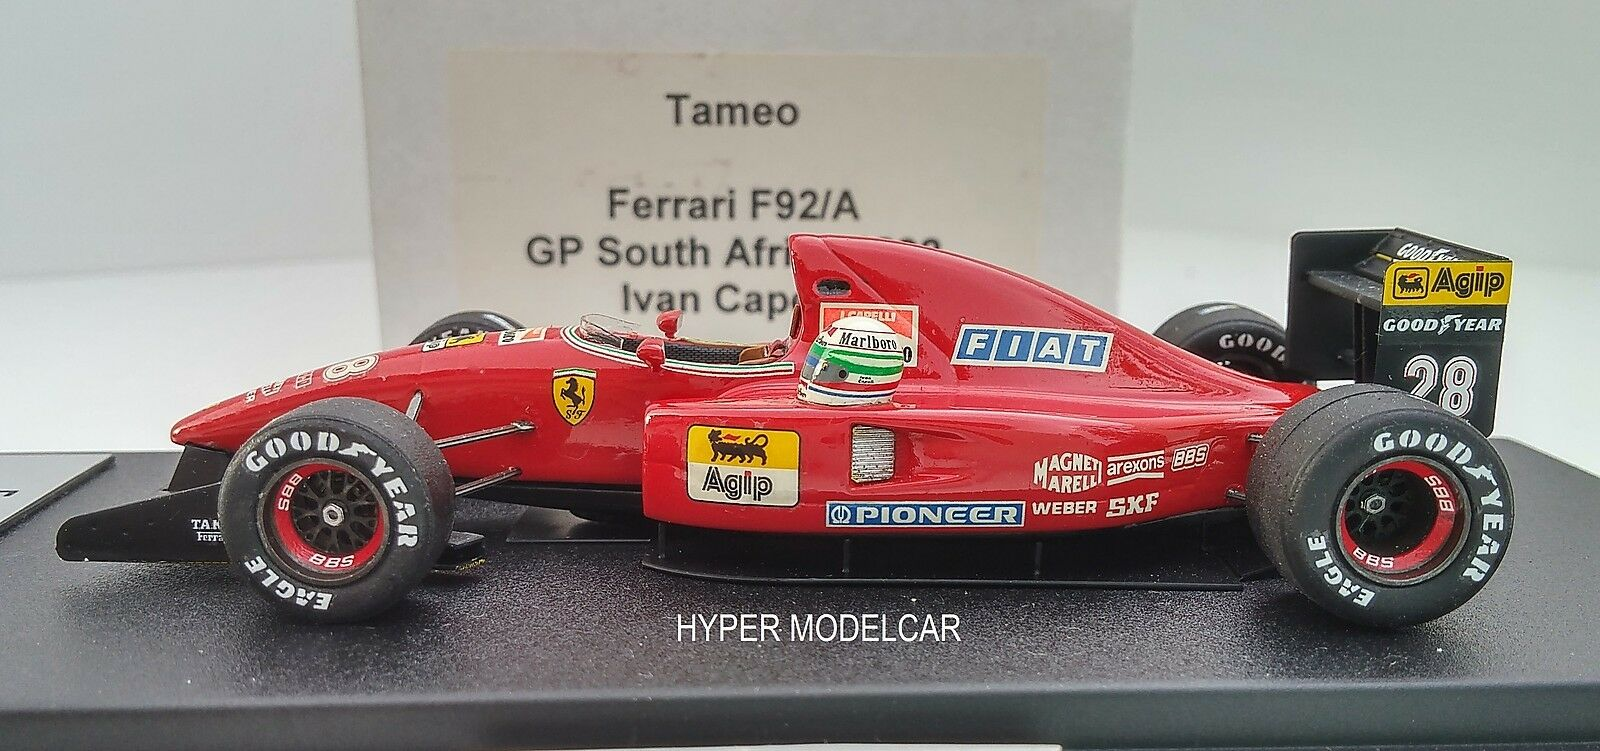 TAMEO KIT 1 43 F1 Ferrari F92A  28 28 28 Gp South Africa 1992 I. Capelli - Whit Helmet 39e98e